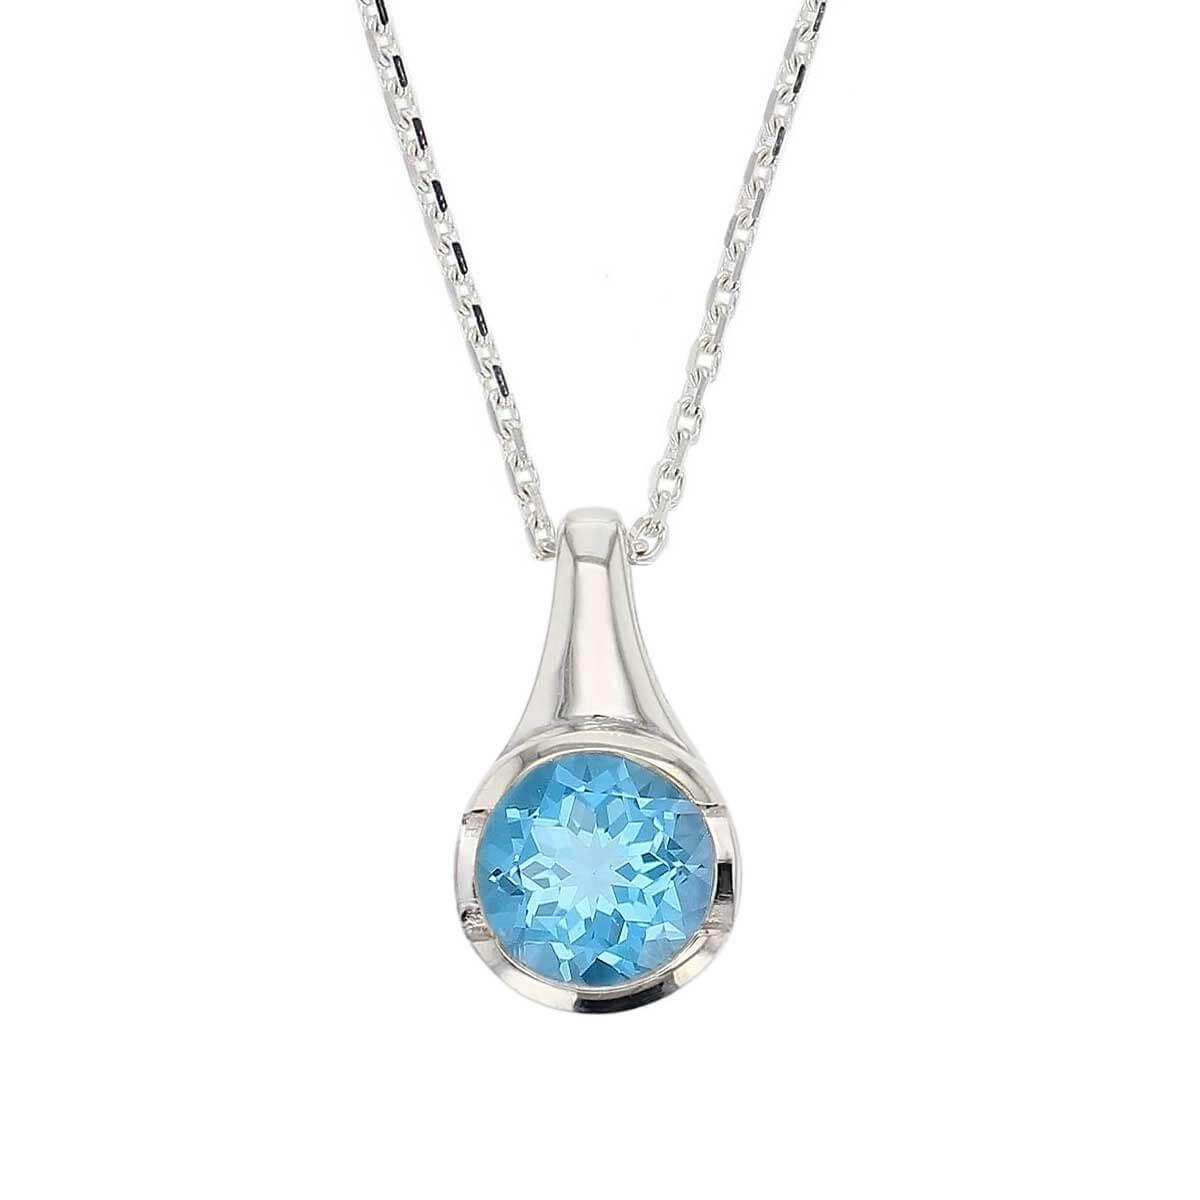 sterling silver round cut faceted topaz gemstone pendant, designer jewellery, blue quartz gem, jewelry, handmade by Faller, Londonderry, Northern Ireland, Irish hand crafted, darcy, D'arcy